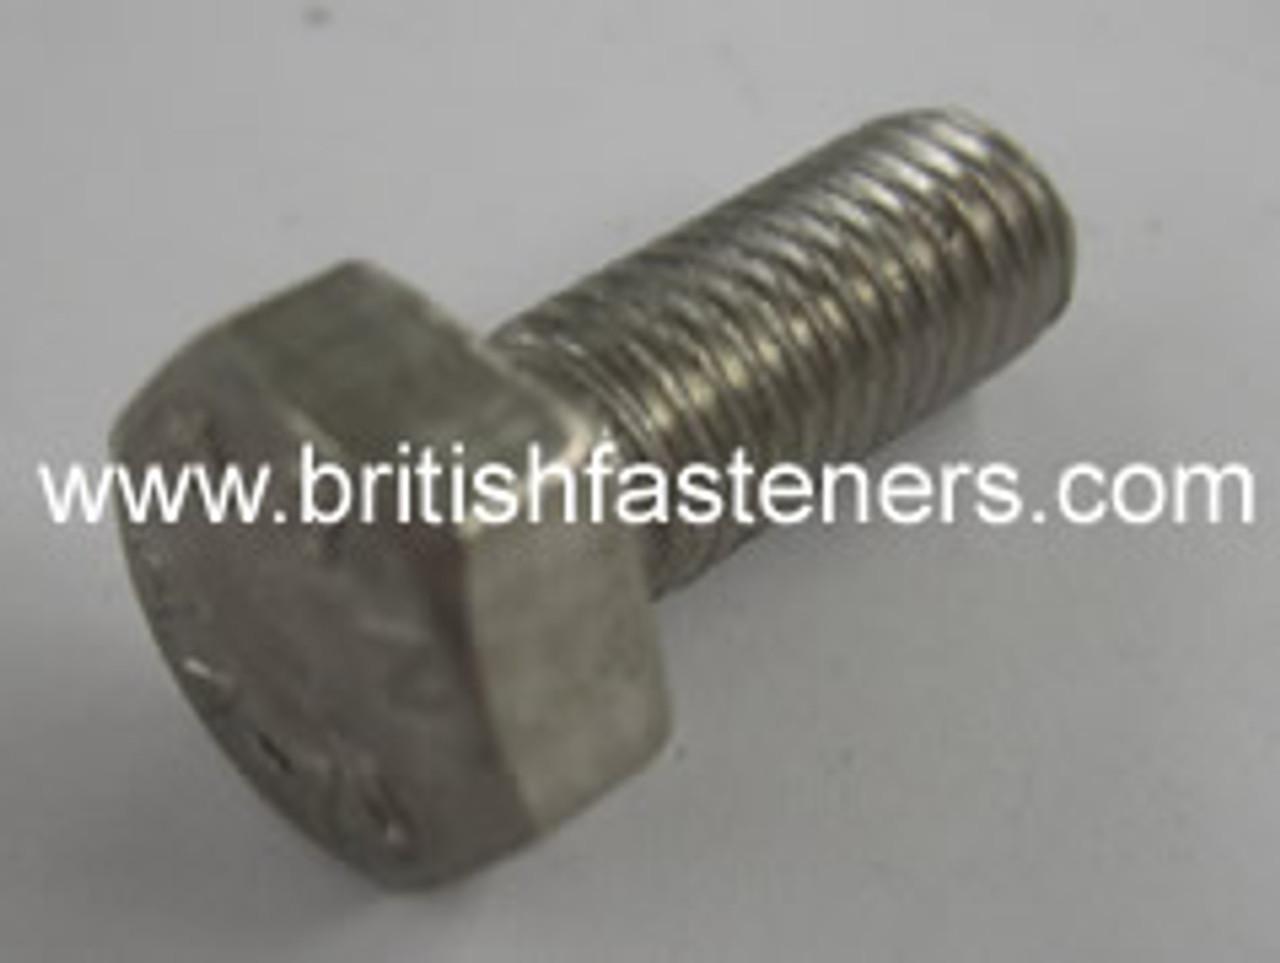 Stainless Screw Metric 8 x 20mm - (7485)